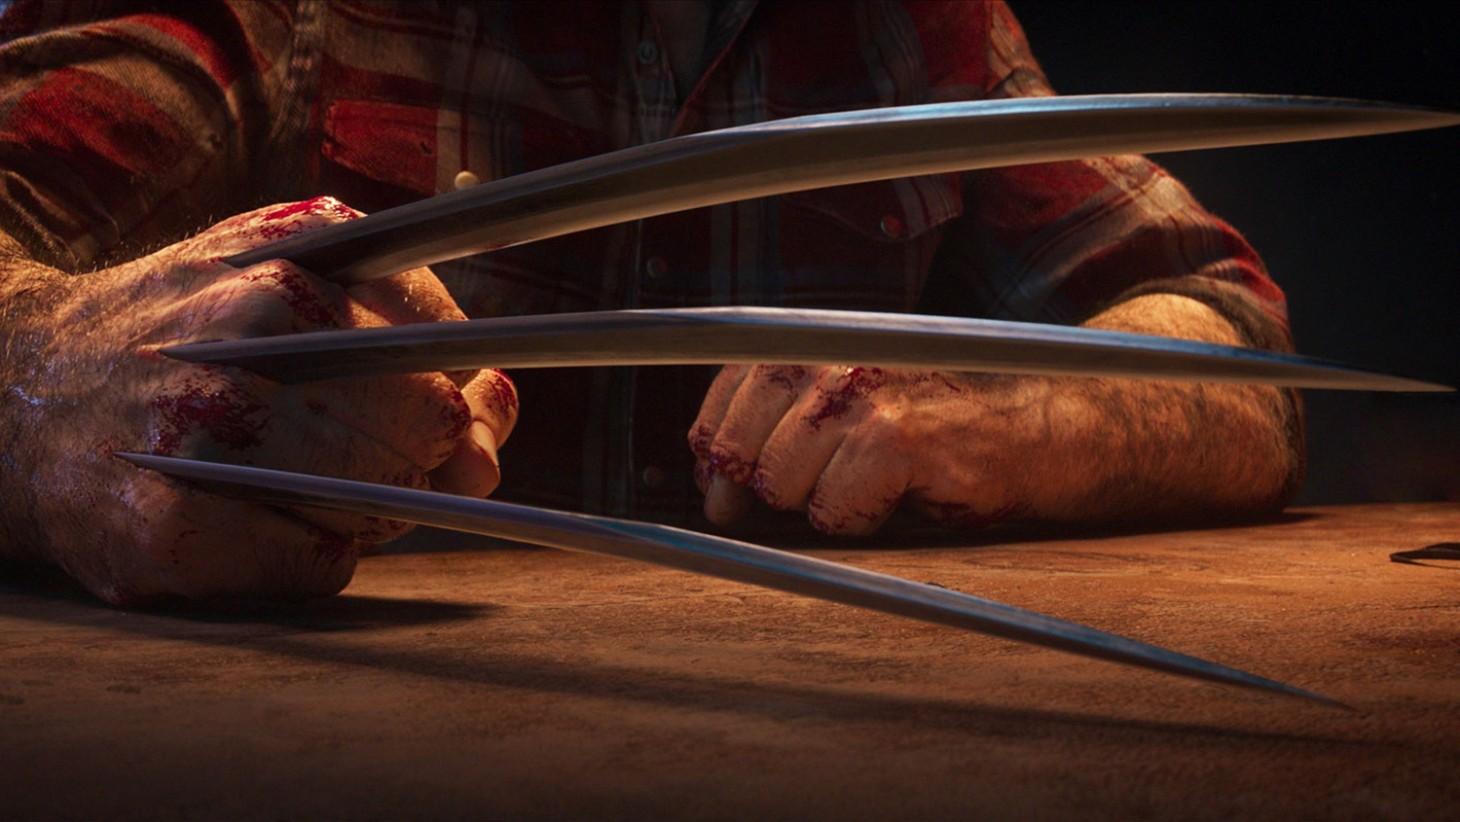 Insomniac Games Reveals New Marvel Wolverine Game During PlayStation  Showcase 2021 - Game Informer